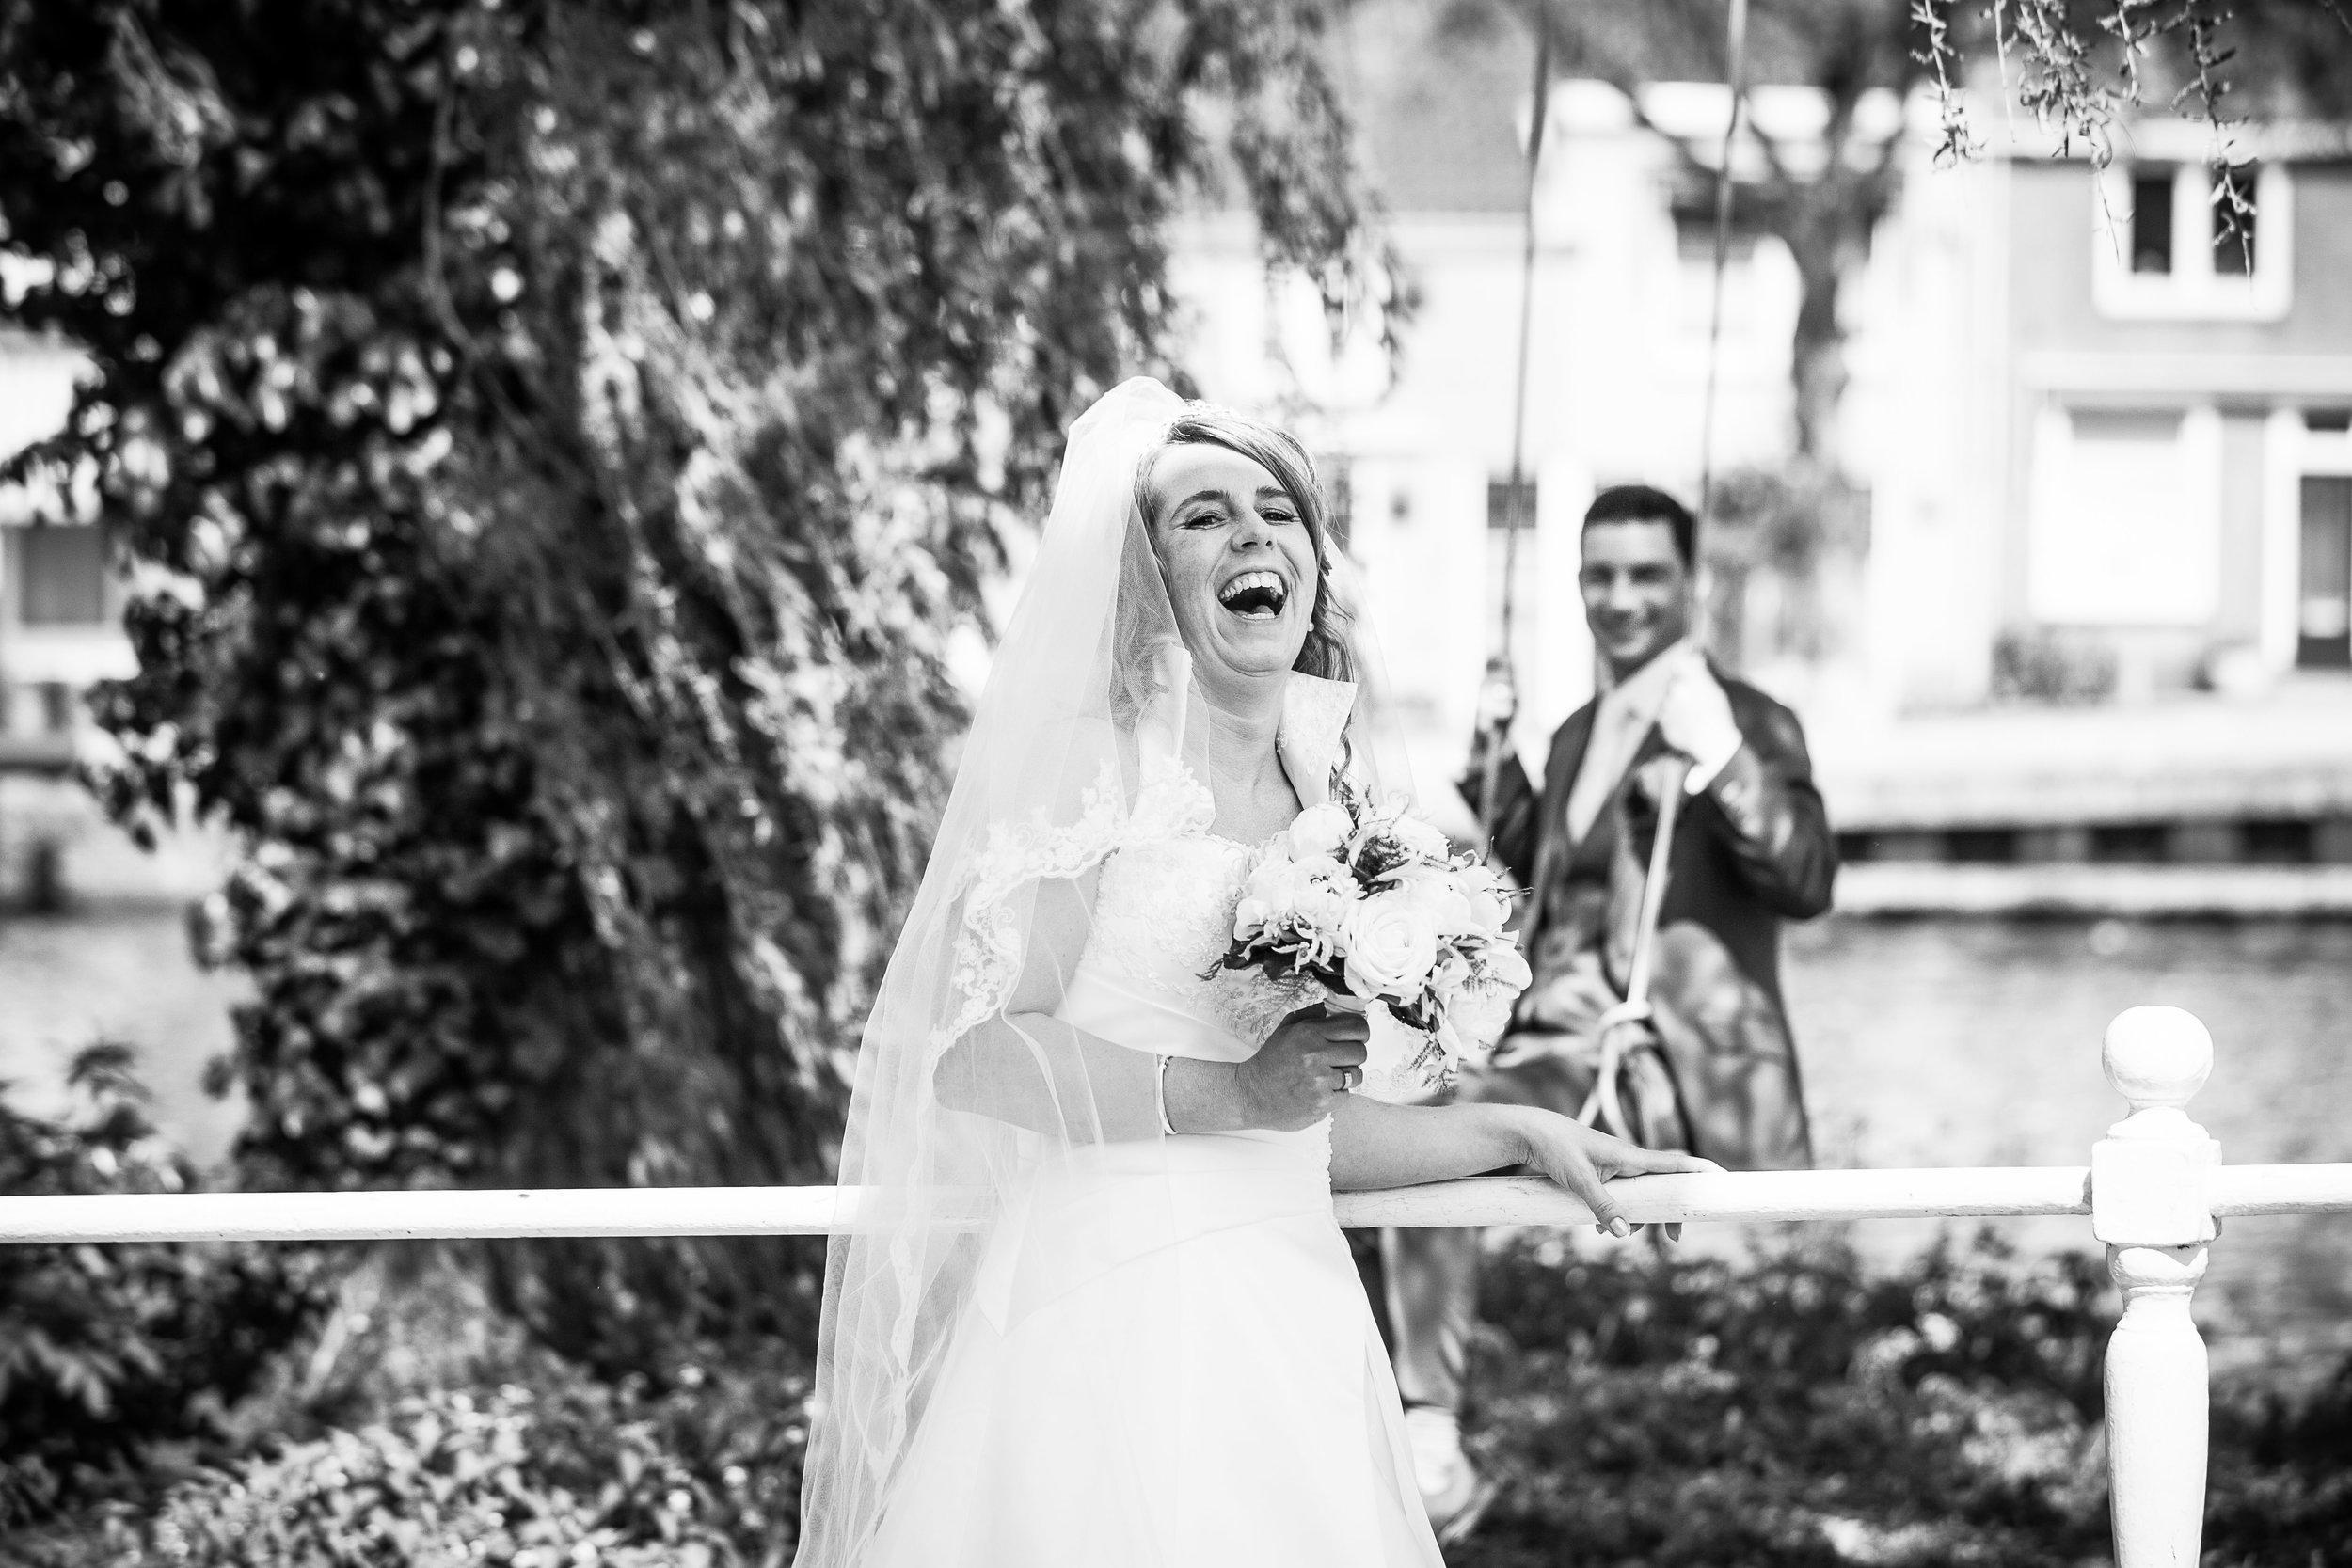 bruidsfotografie-trouwreportage-huwelijksfotografie-bruidsfotograaf-feestfotografie-Anouk en Edgar-76.jpg